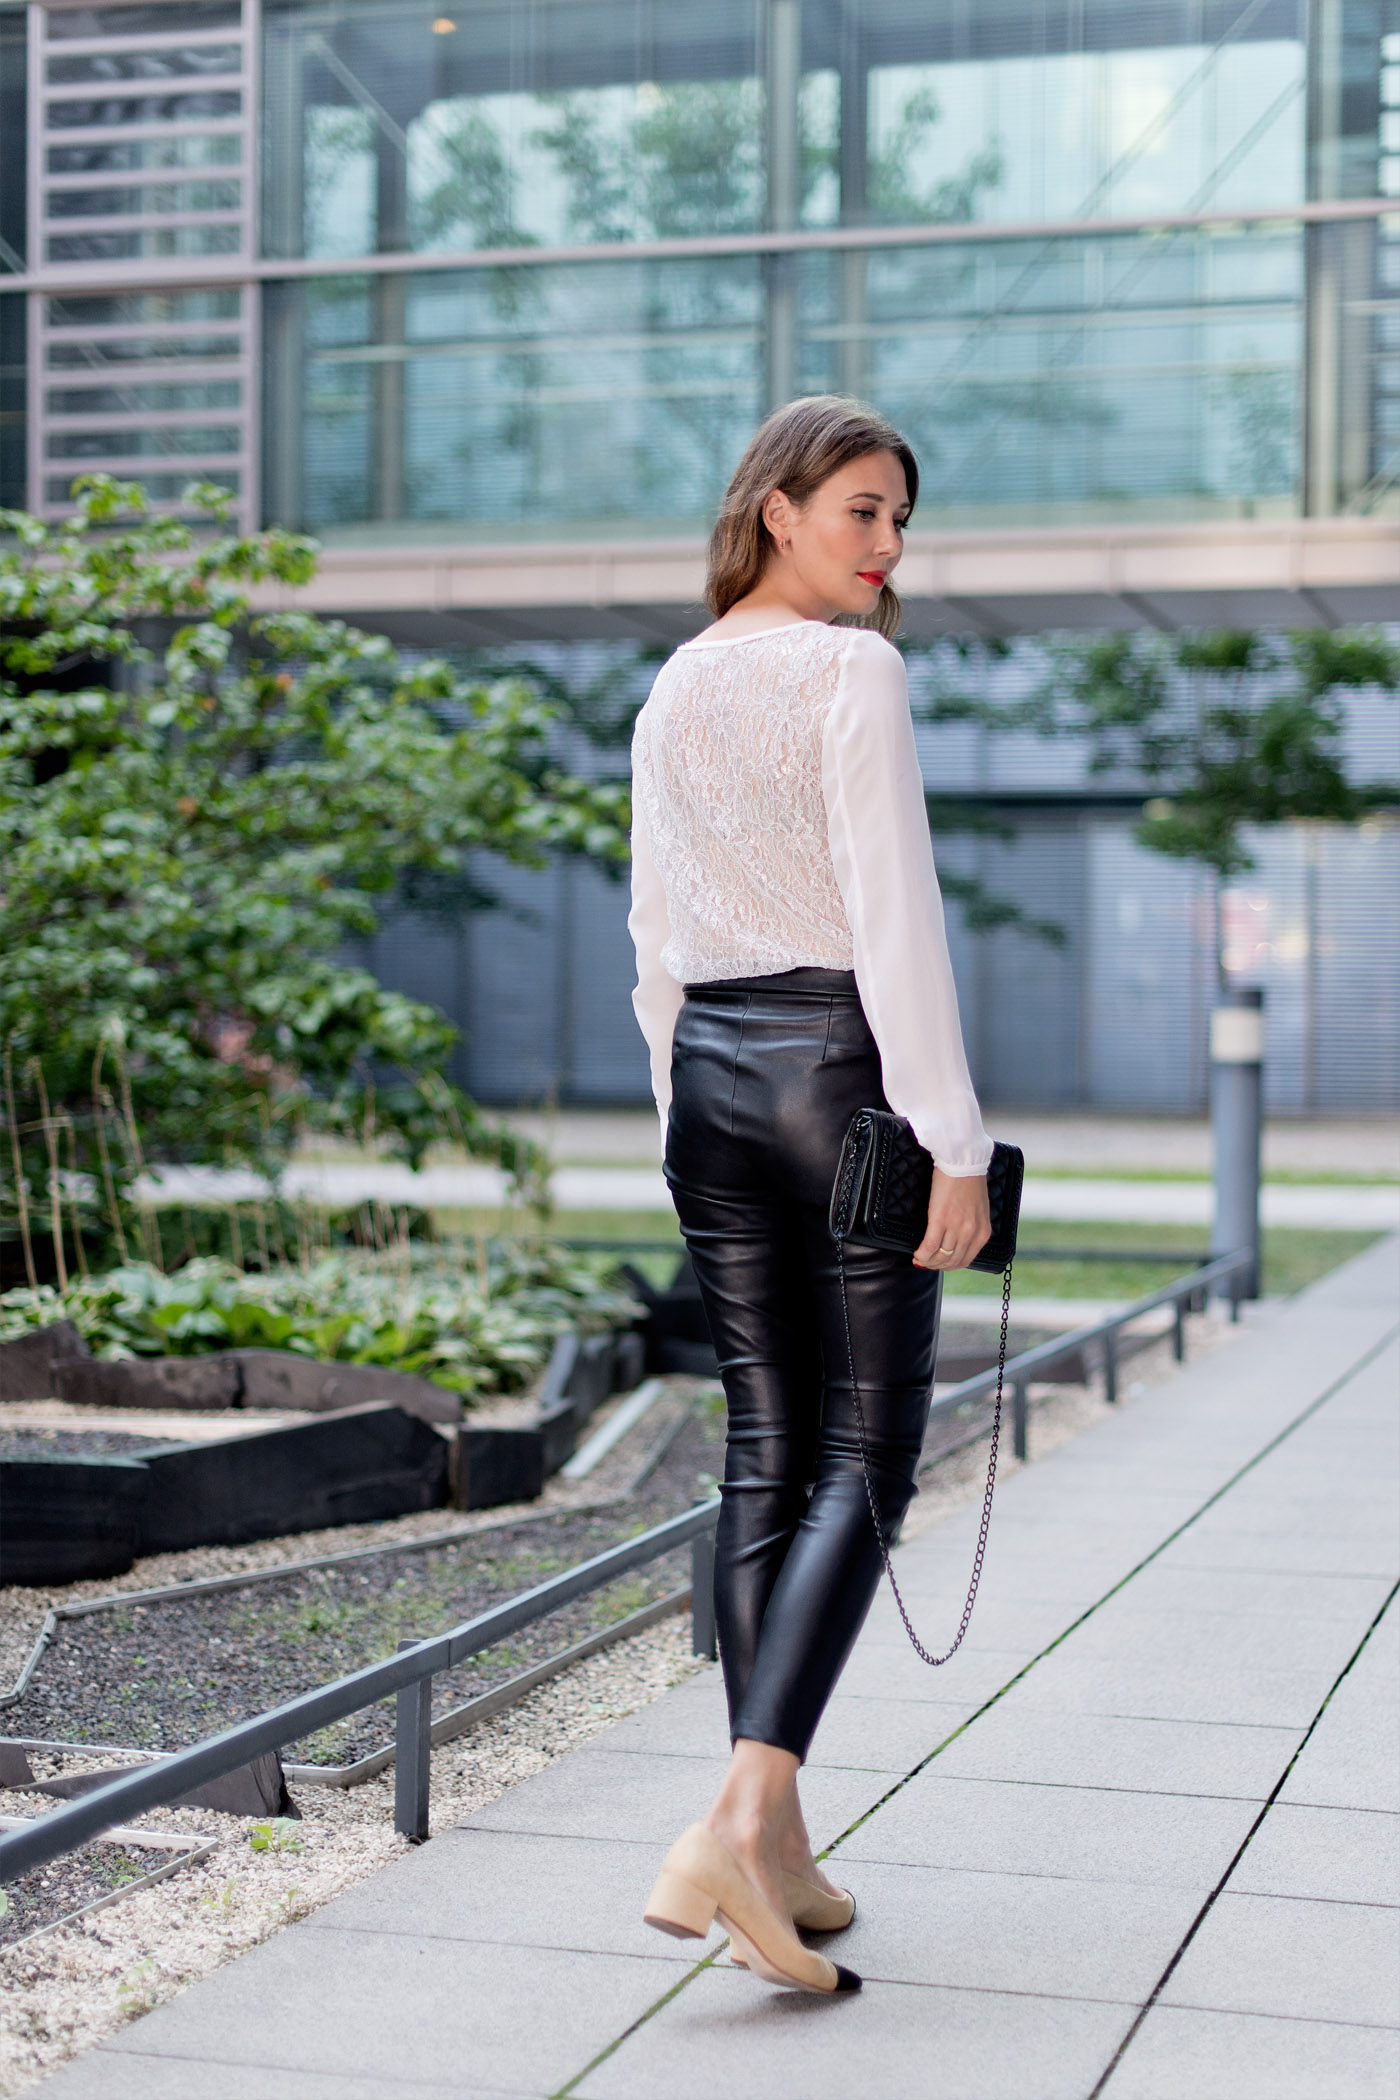 by malene birger seidenbluse lederhose zara slingback pumps rebecca minkoff fashionblog 5 mood. Black Bedroom Furniture Sets. Home Design Ideas